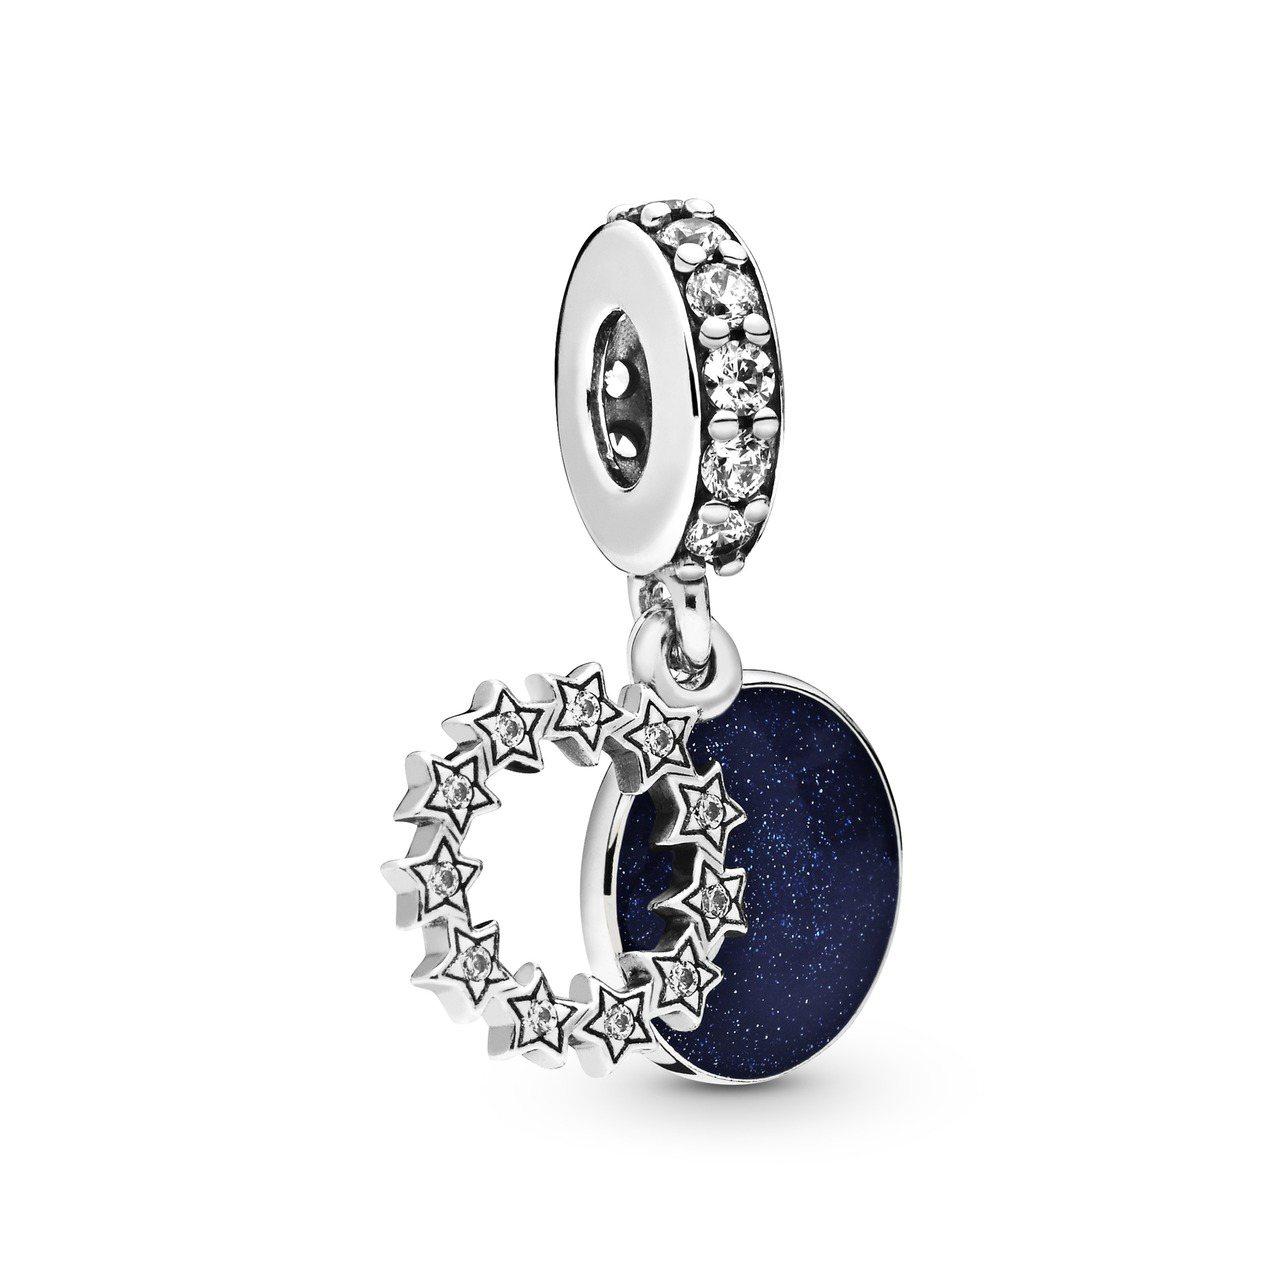 Pandora夜空繁星925銀琺瑯串飾2,480元。圖/Pandora提供